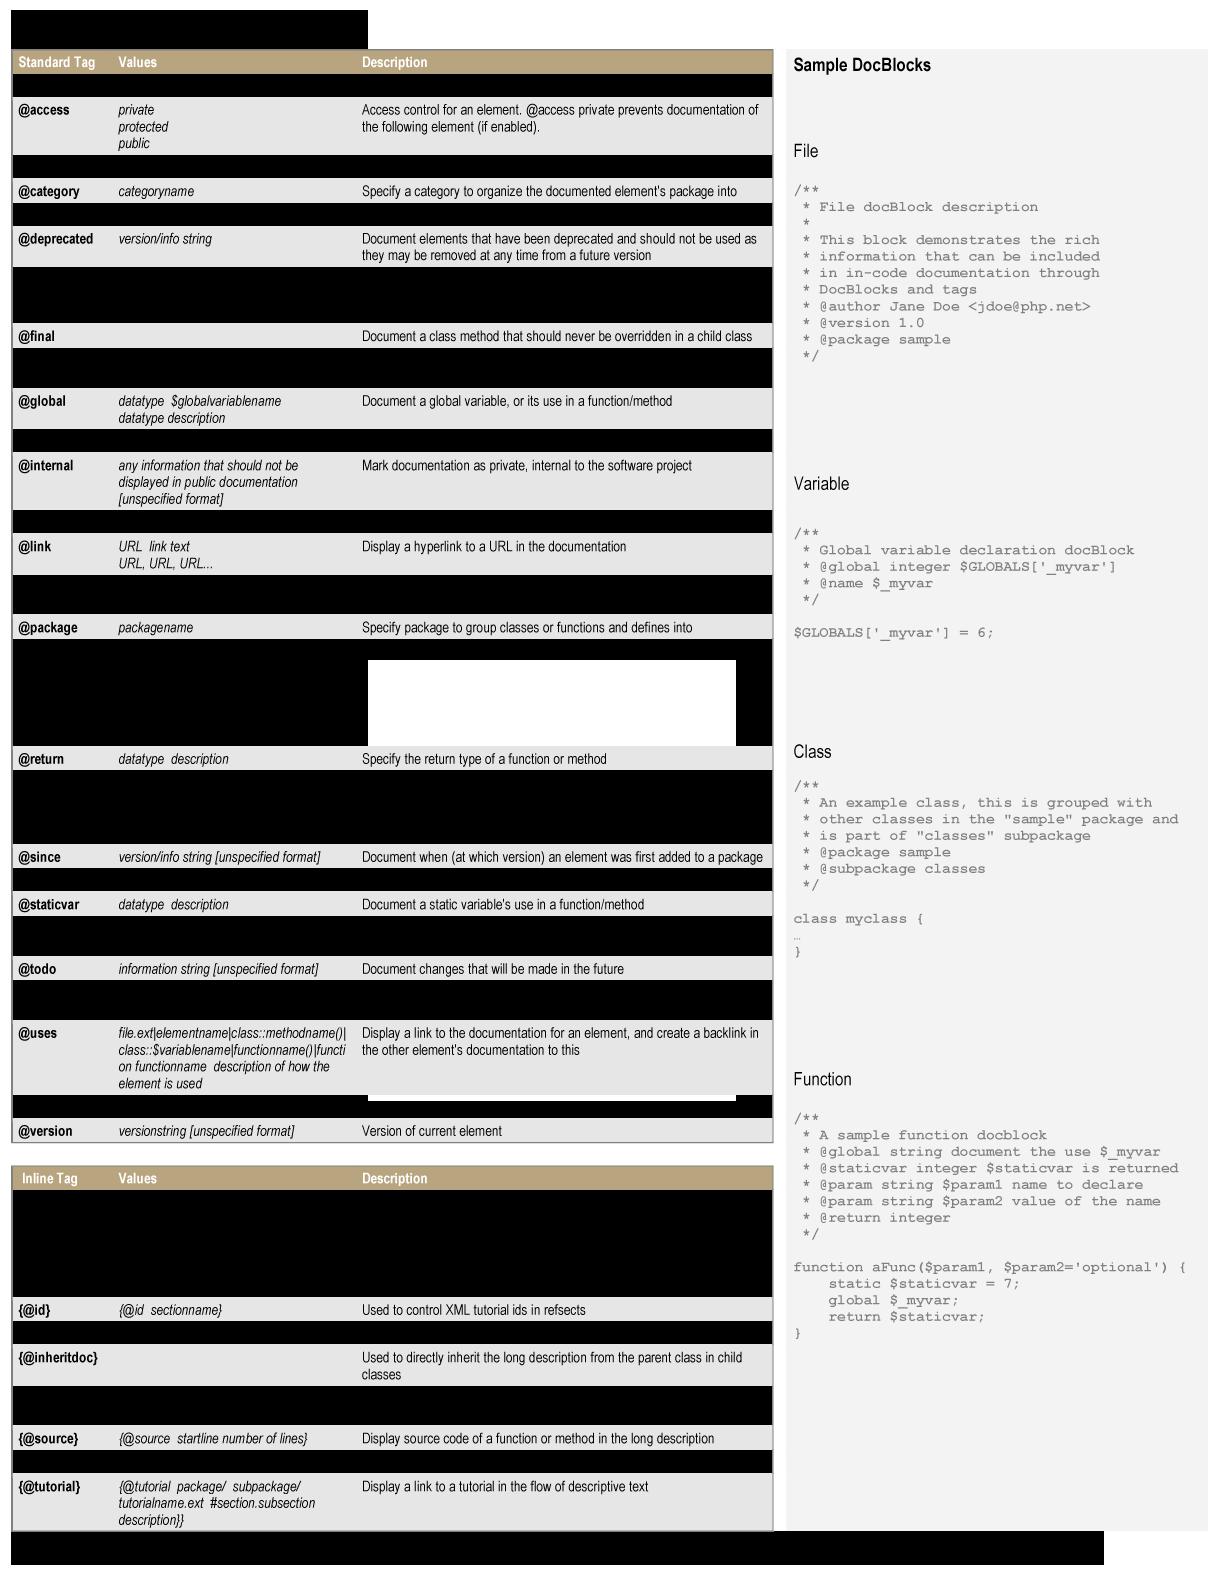 phpDocumentor cheatsheet